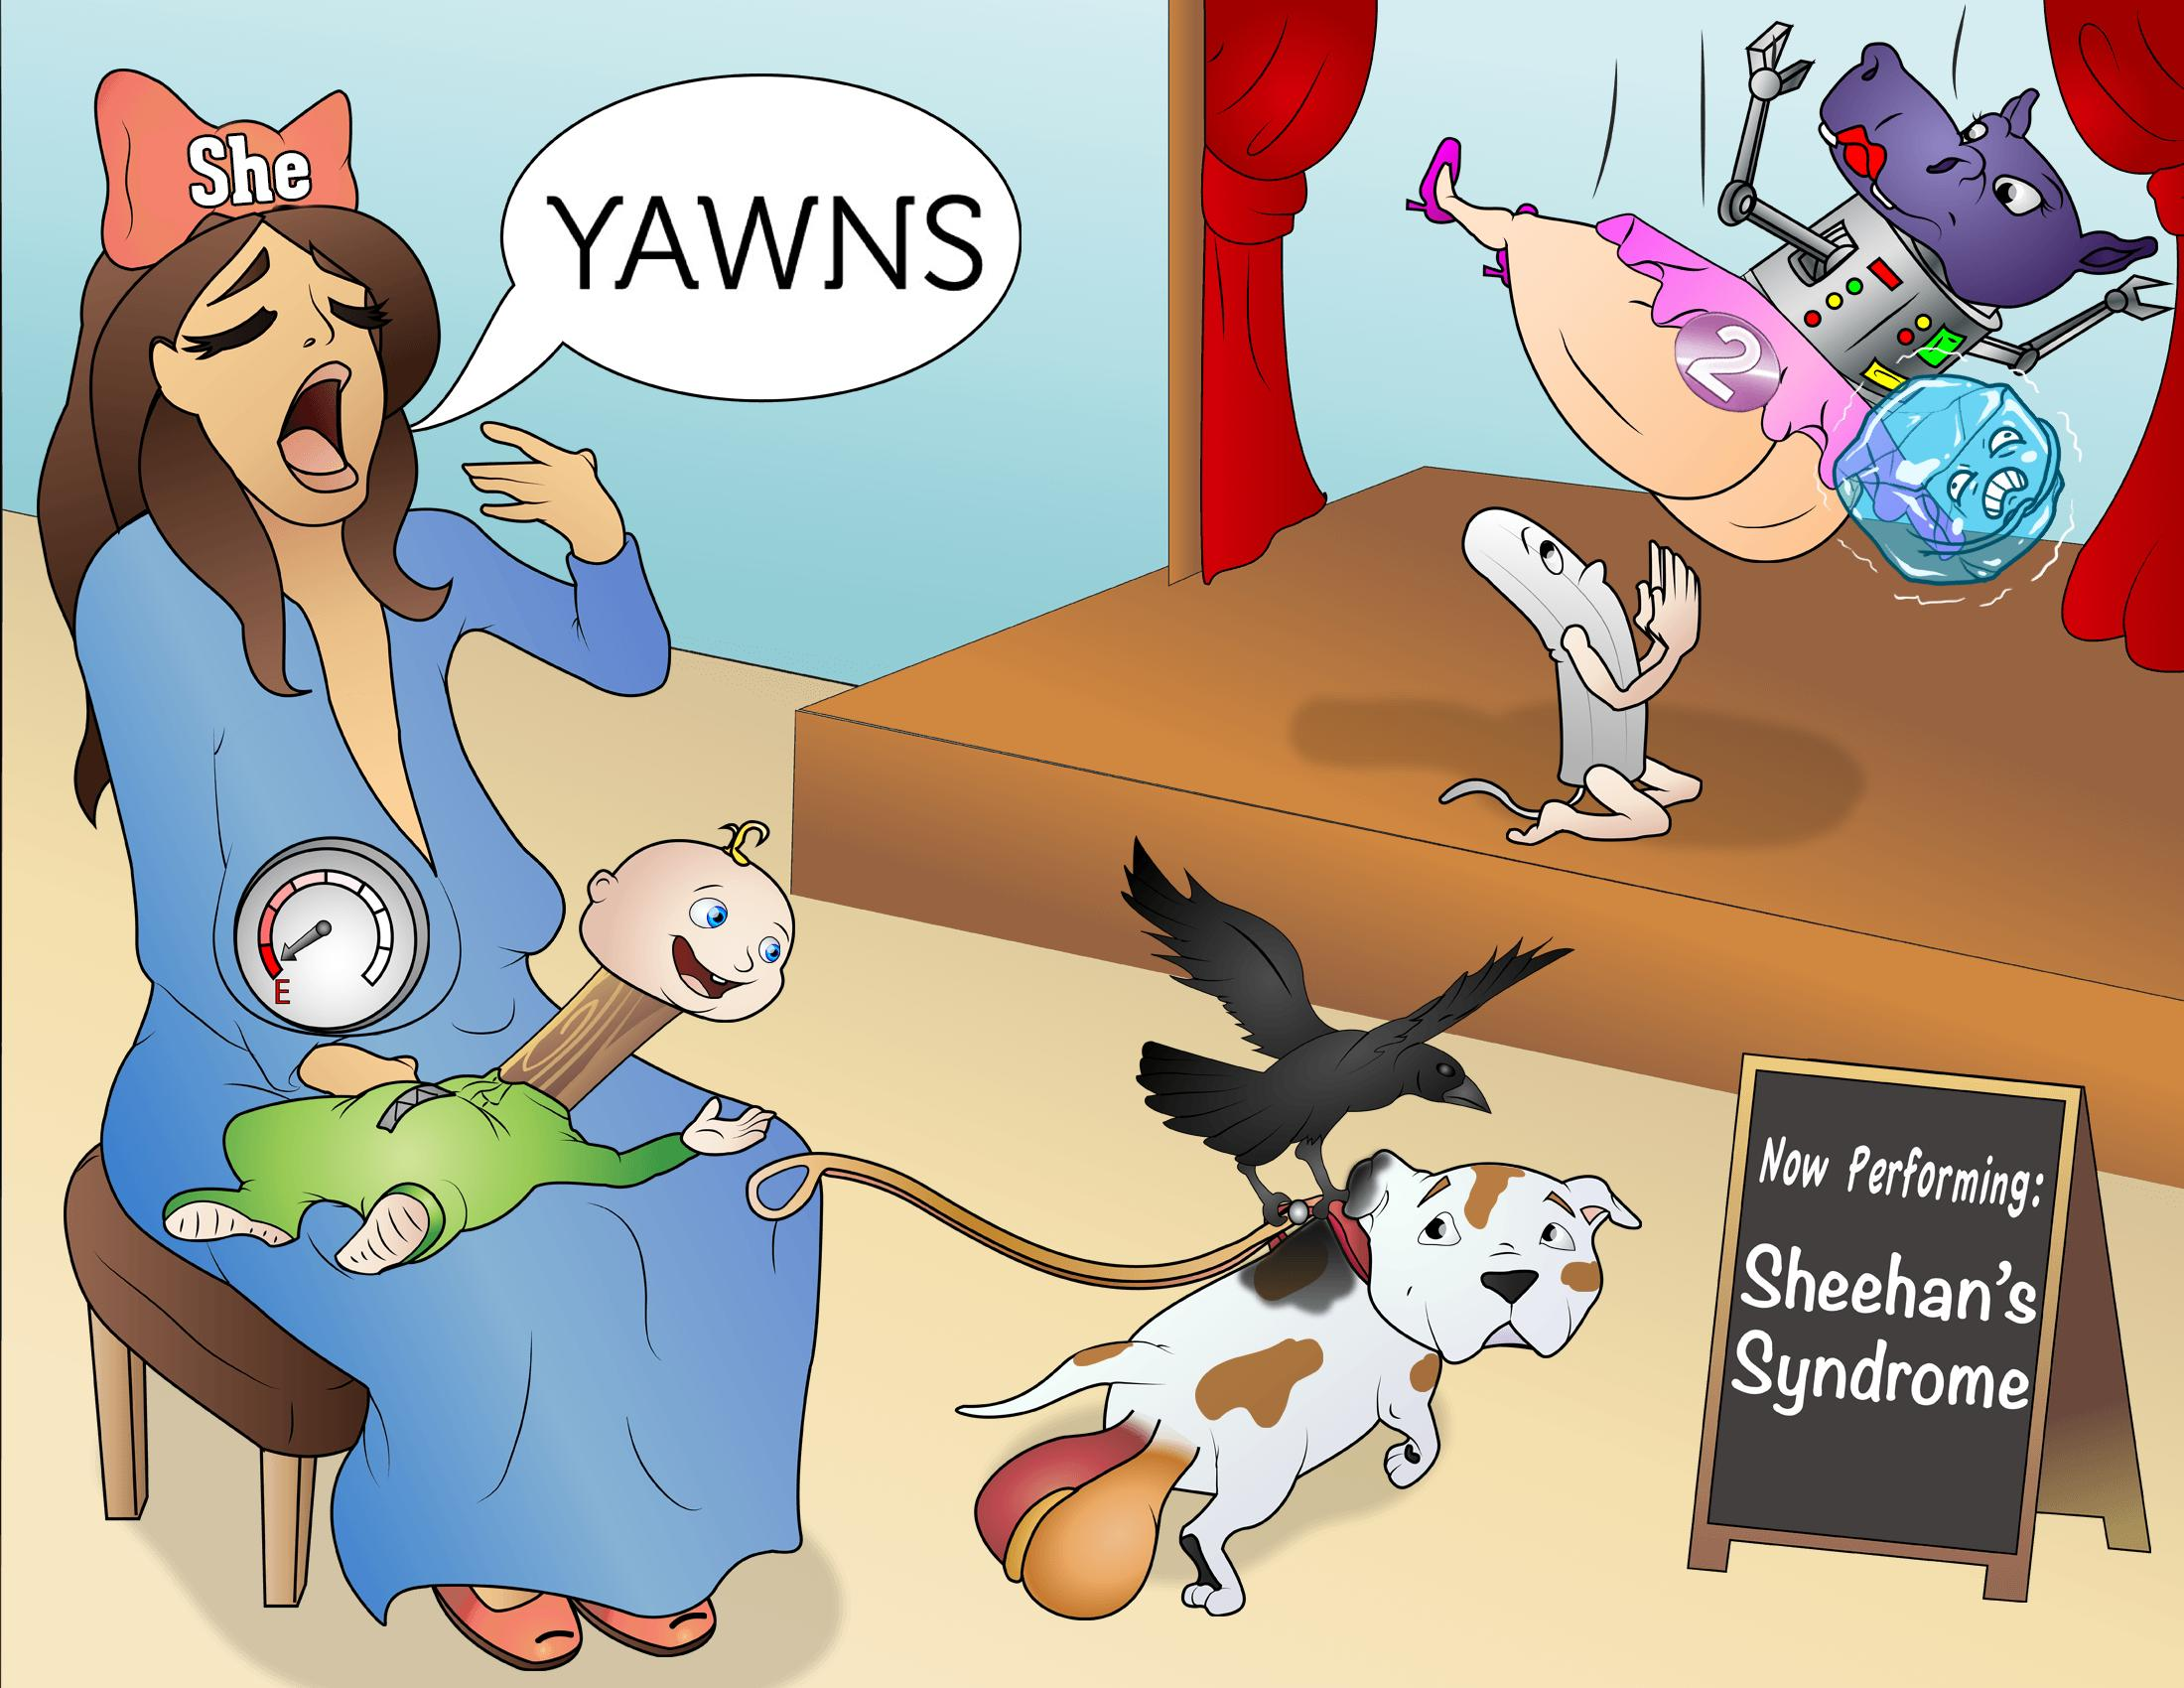 Sheehan's Syndrome